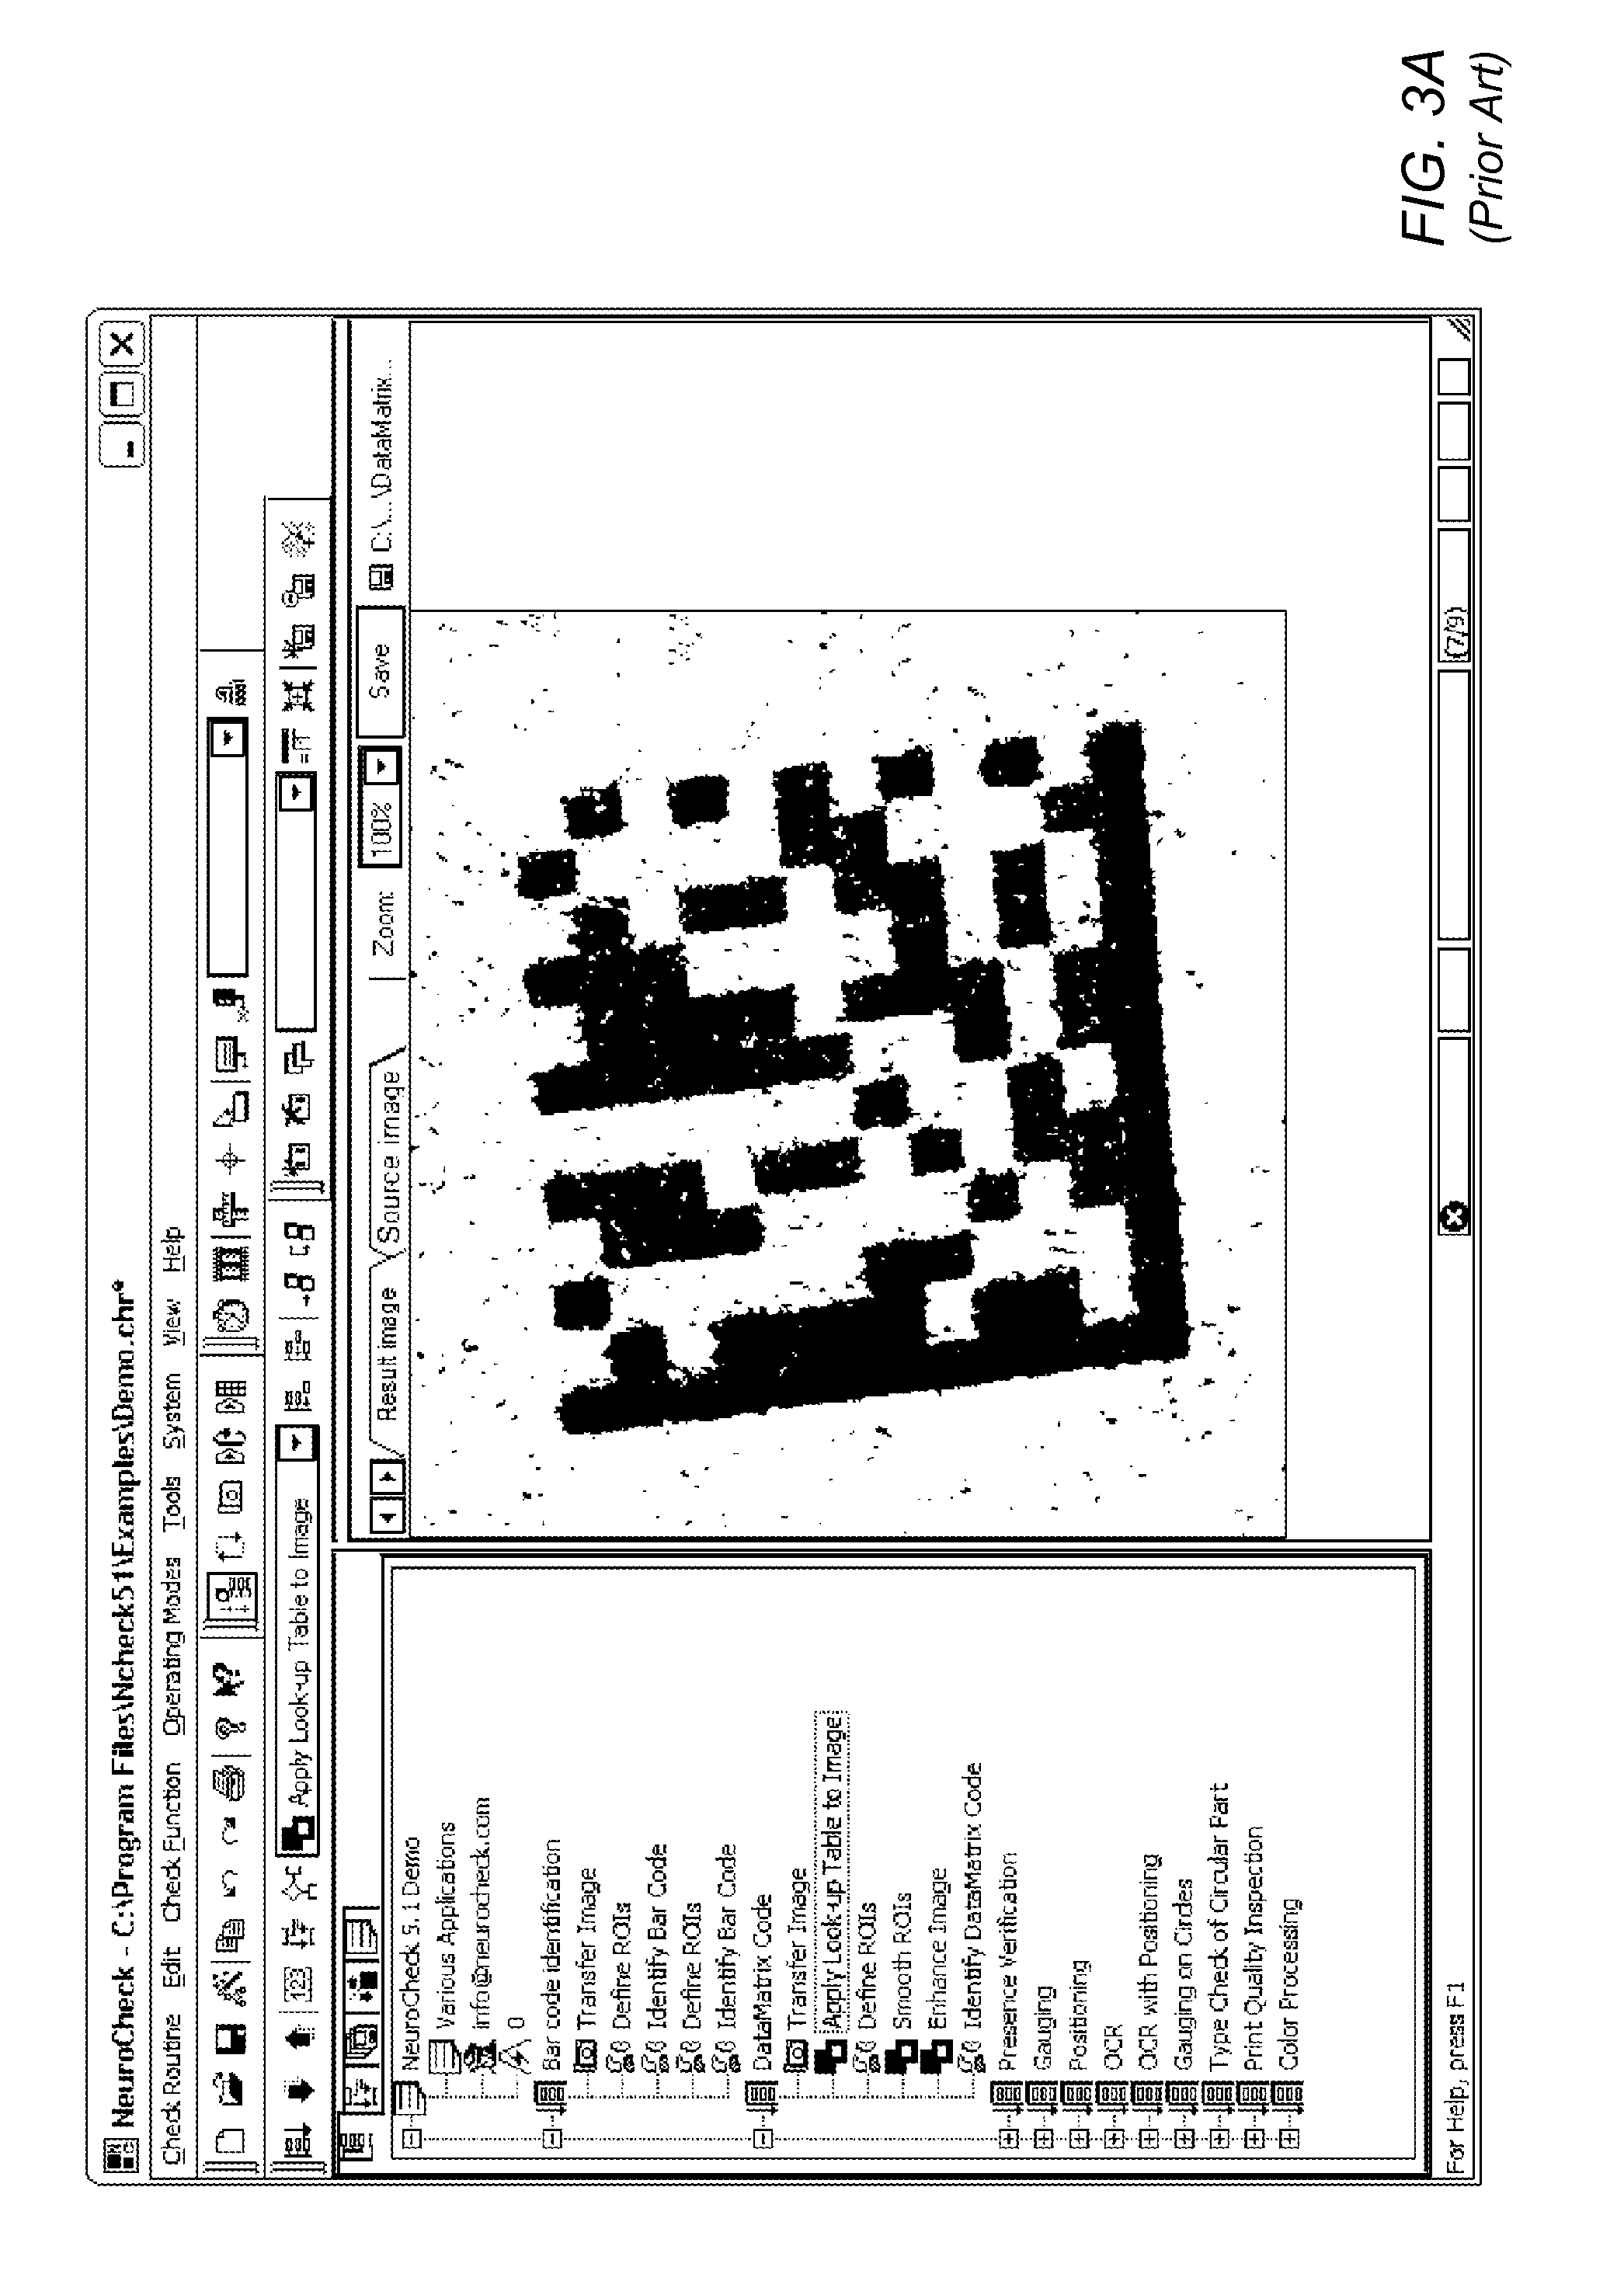 how to make a state machine diagram using visio